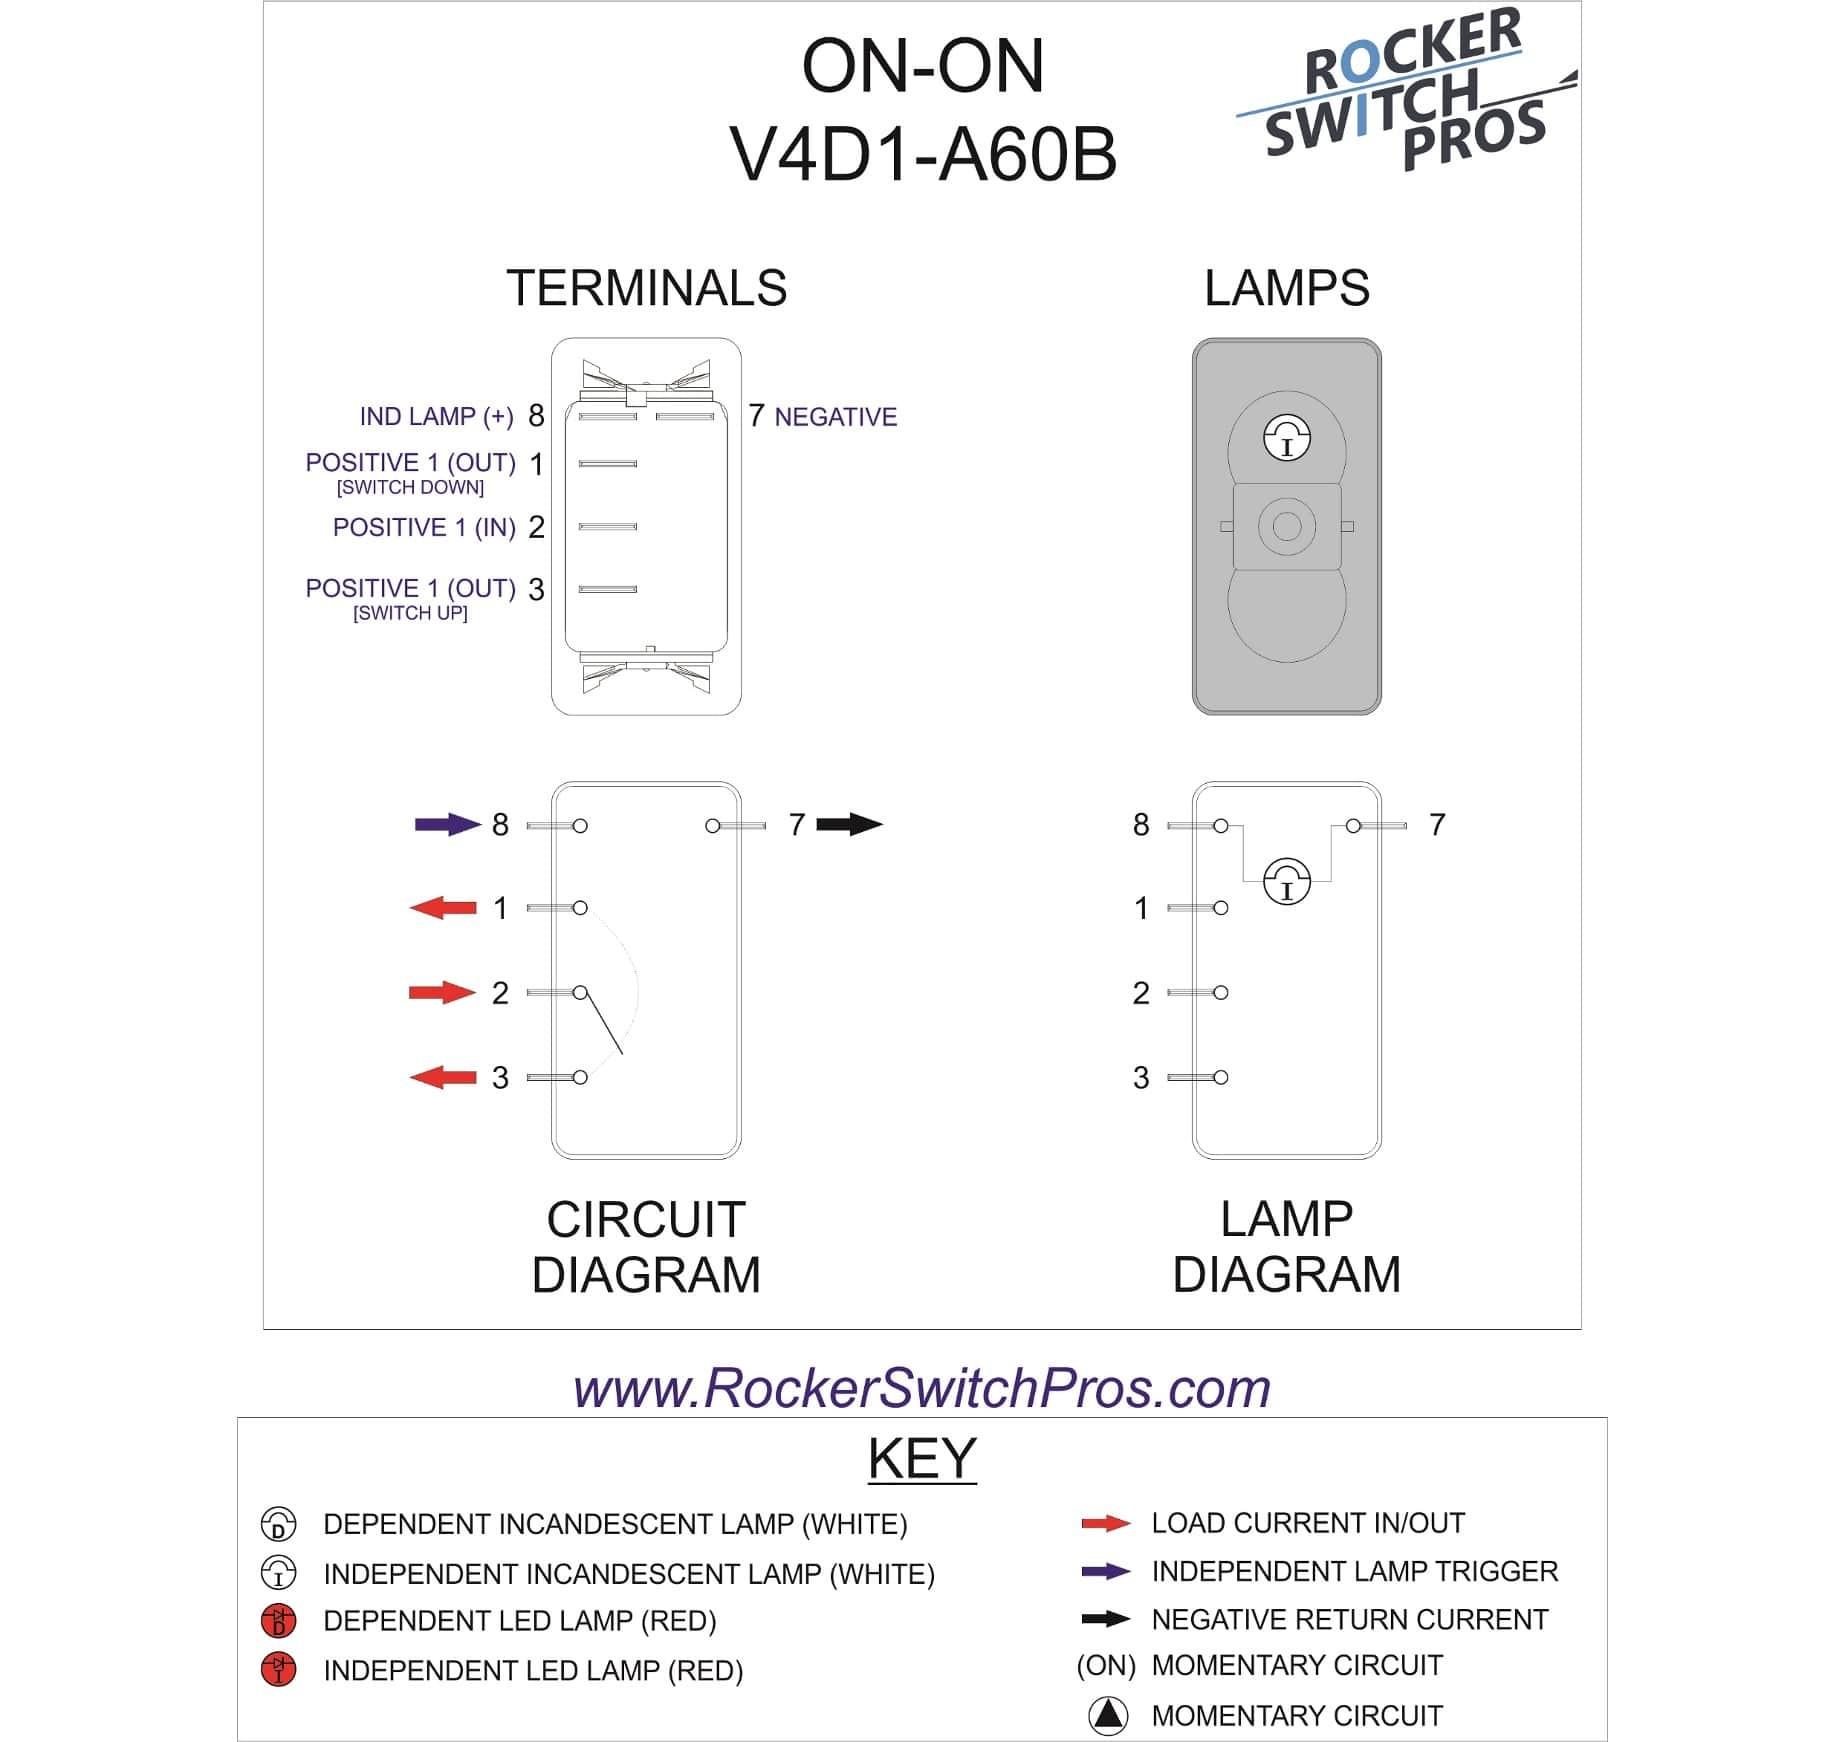 hight resolution of switch wiring diagram for wiper motor rocker custom wiring diagram u2022 rh littlewaves co 1979 corvette